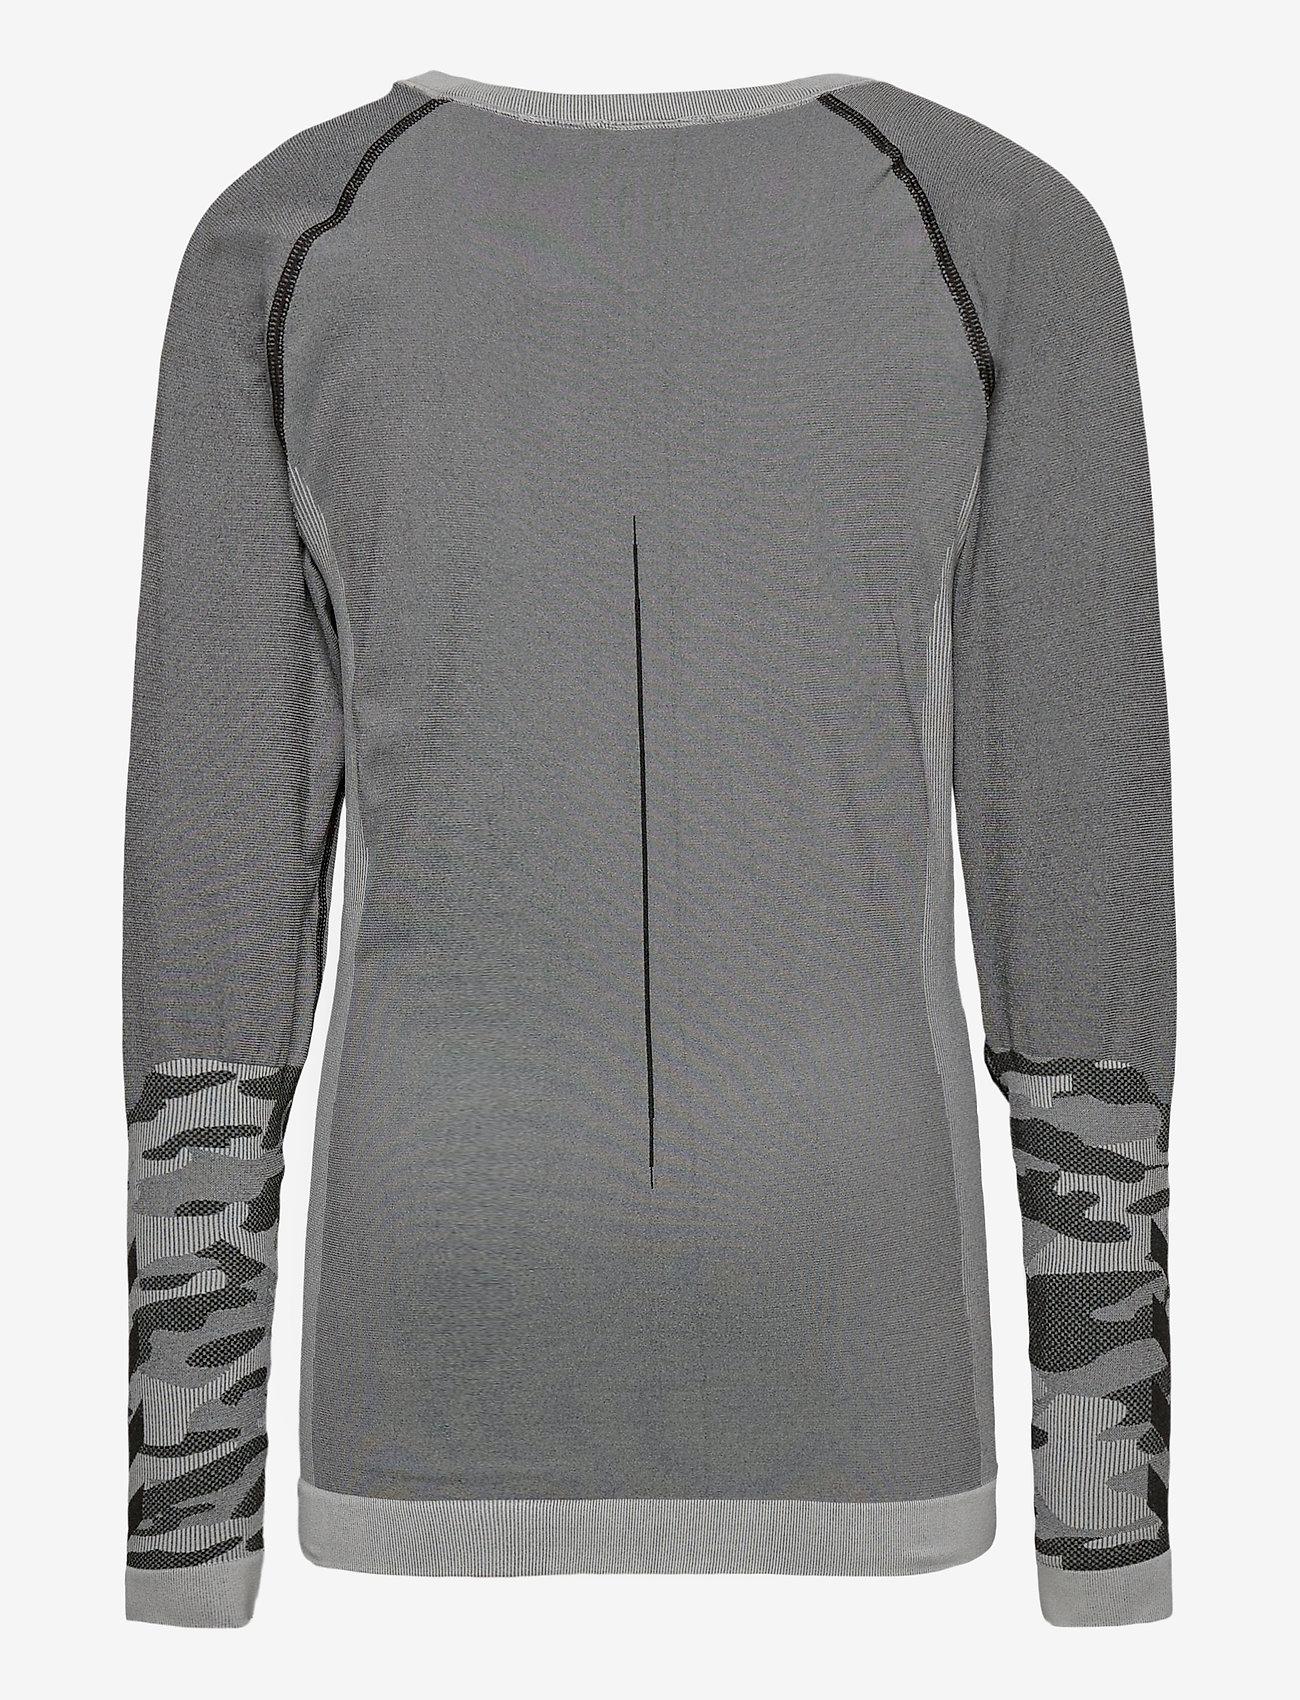 Hummel - hmlMAX SEAMLESS T-SHIRT L/S - long-sleeved t-shirts - medium melange - 1